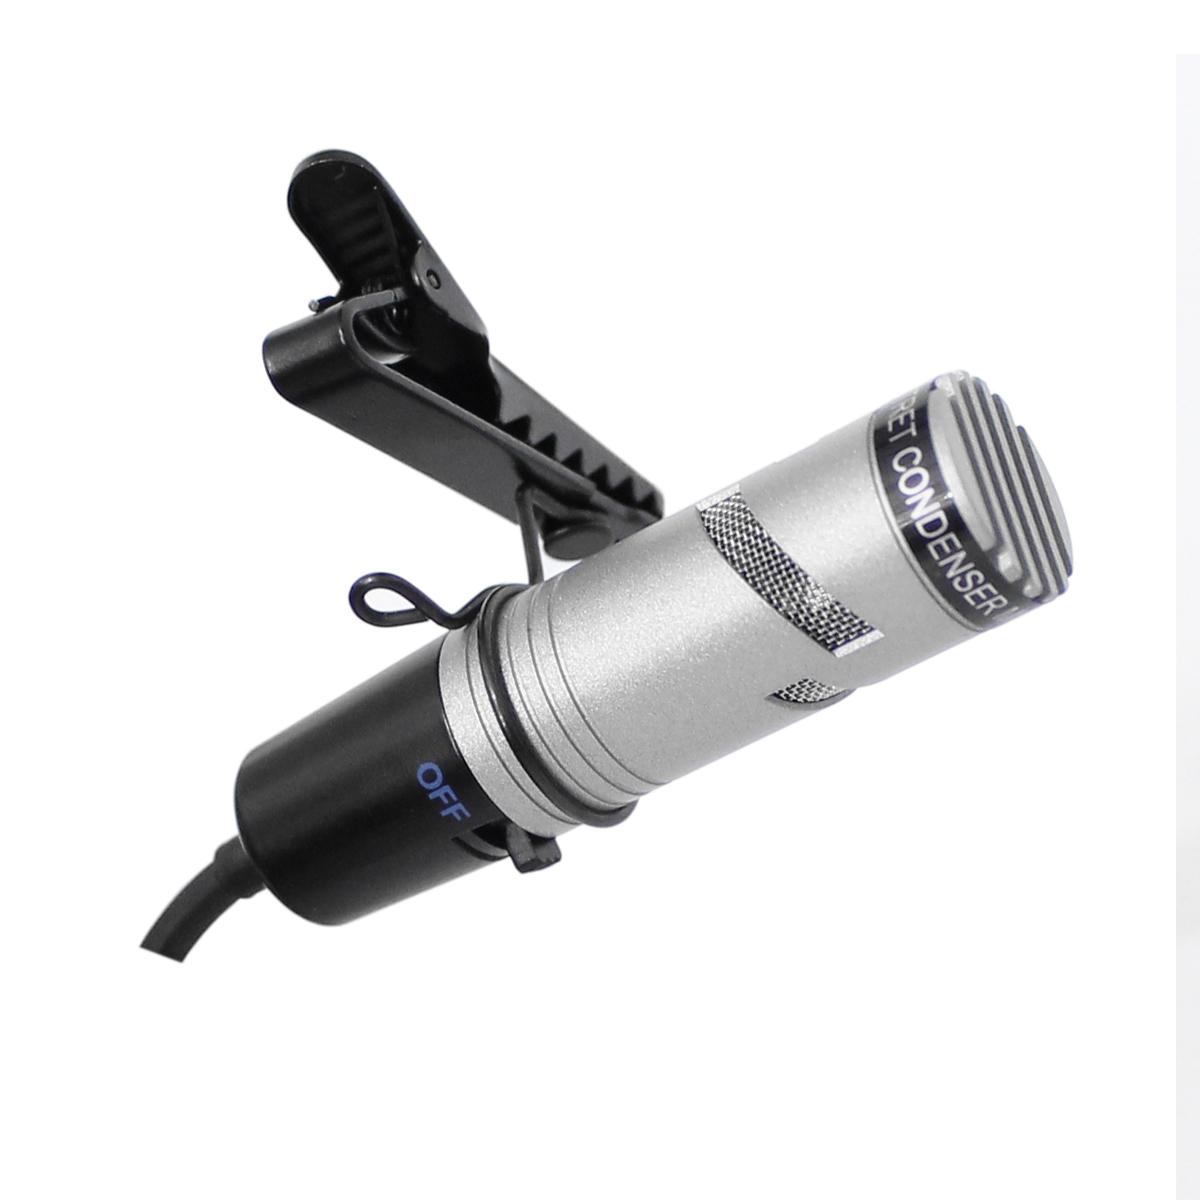 Microfone c/ Fio Lapela / Mesa - SC 400 YOGA